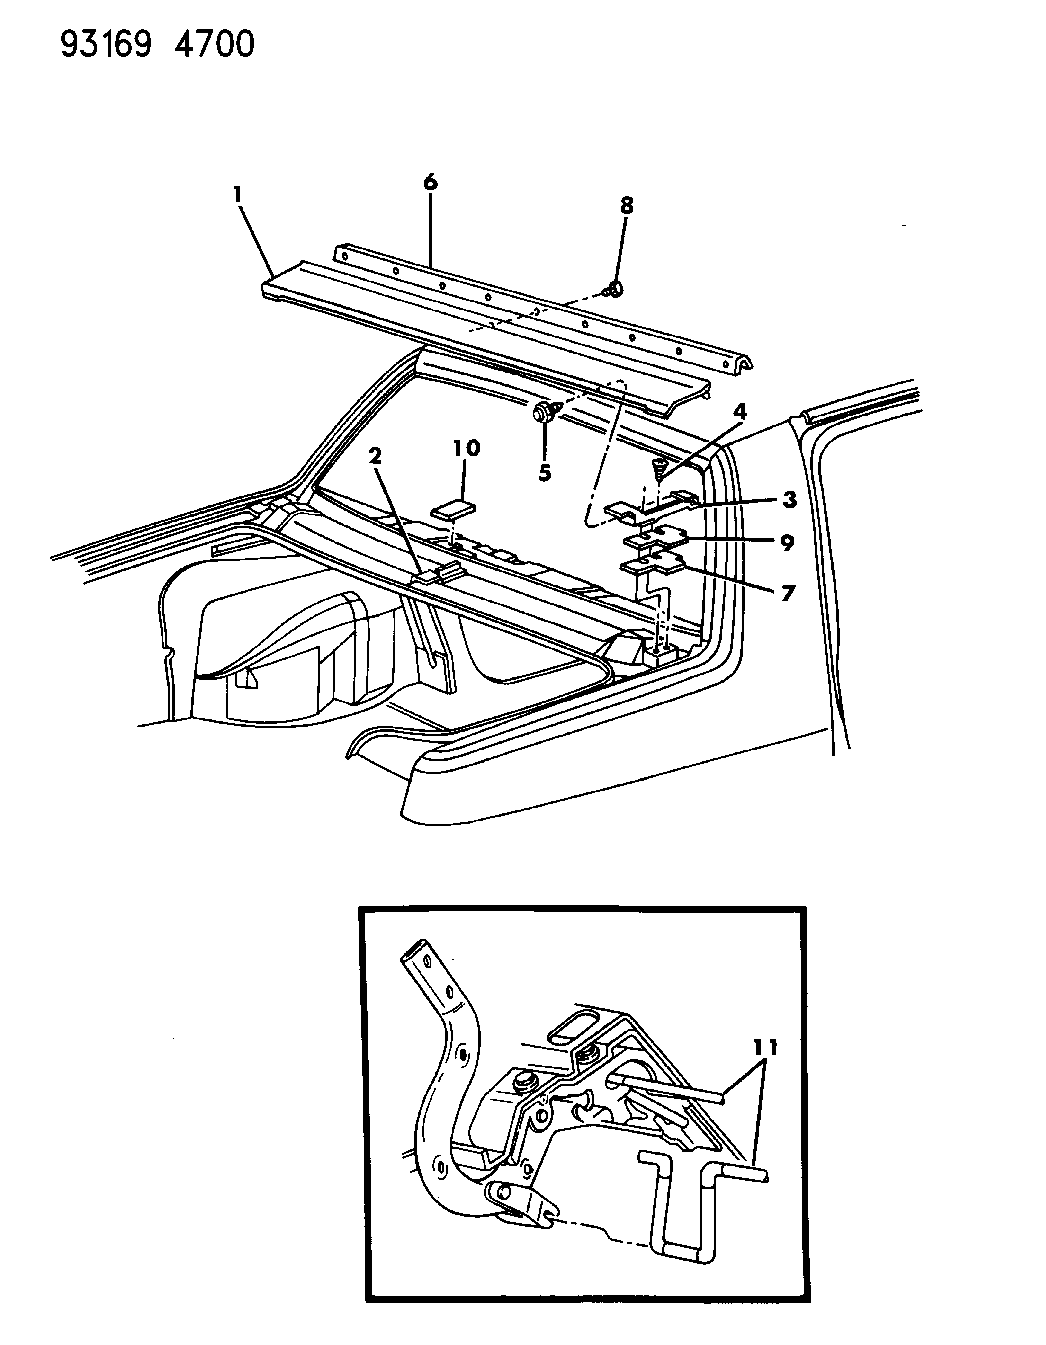 1993 Dodge Spirit Deck Lid Upper Panel Mopar Parts Giant Wiring Diagram